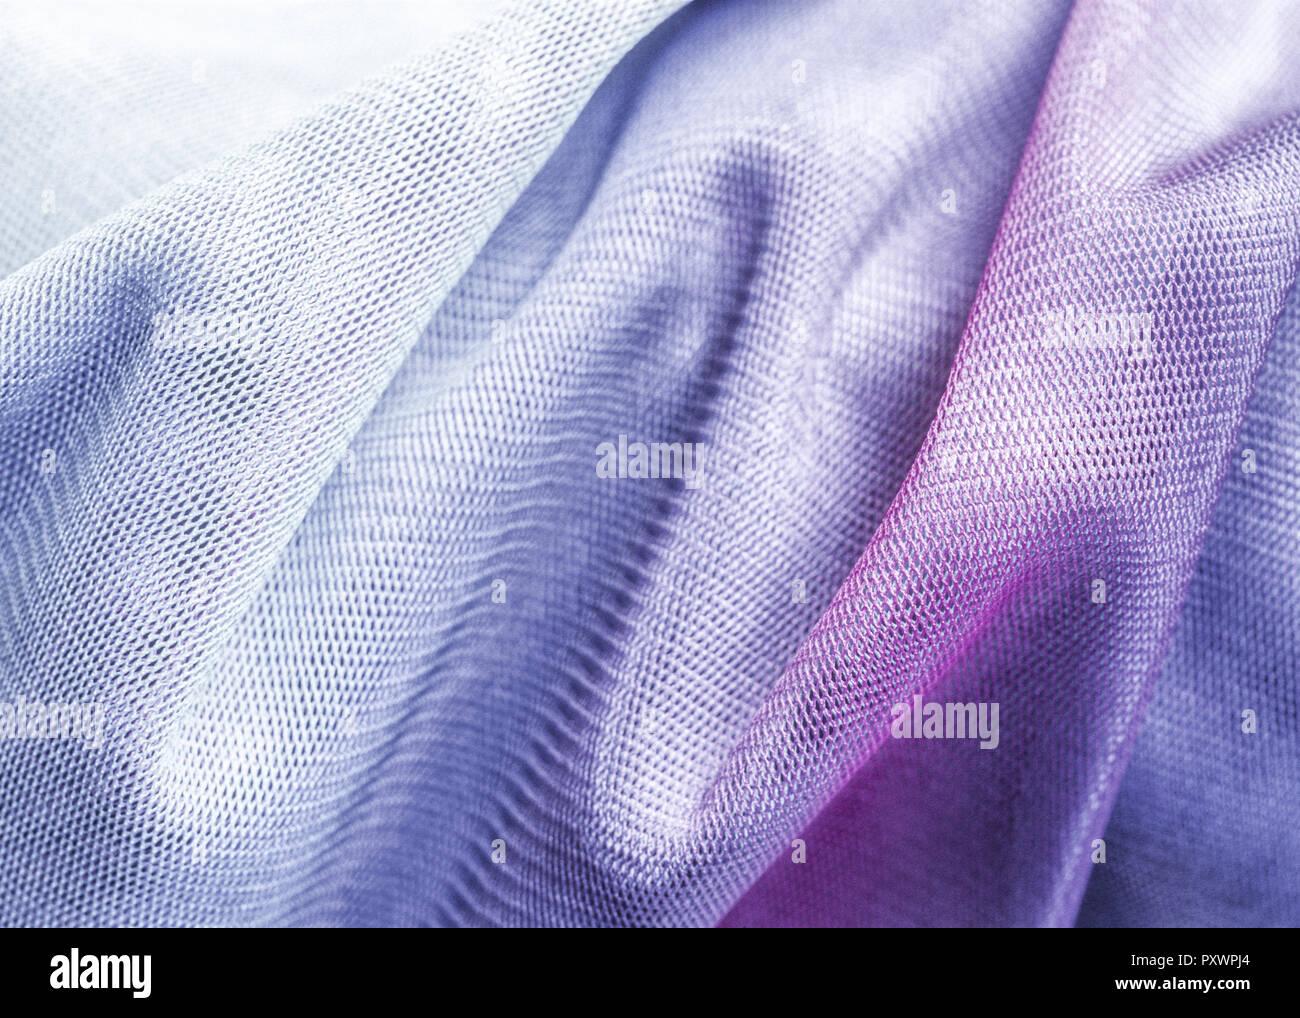 Stoff mit lila Farbverlauf mit Faltenwurf - Stock Image